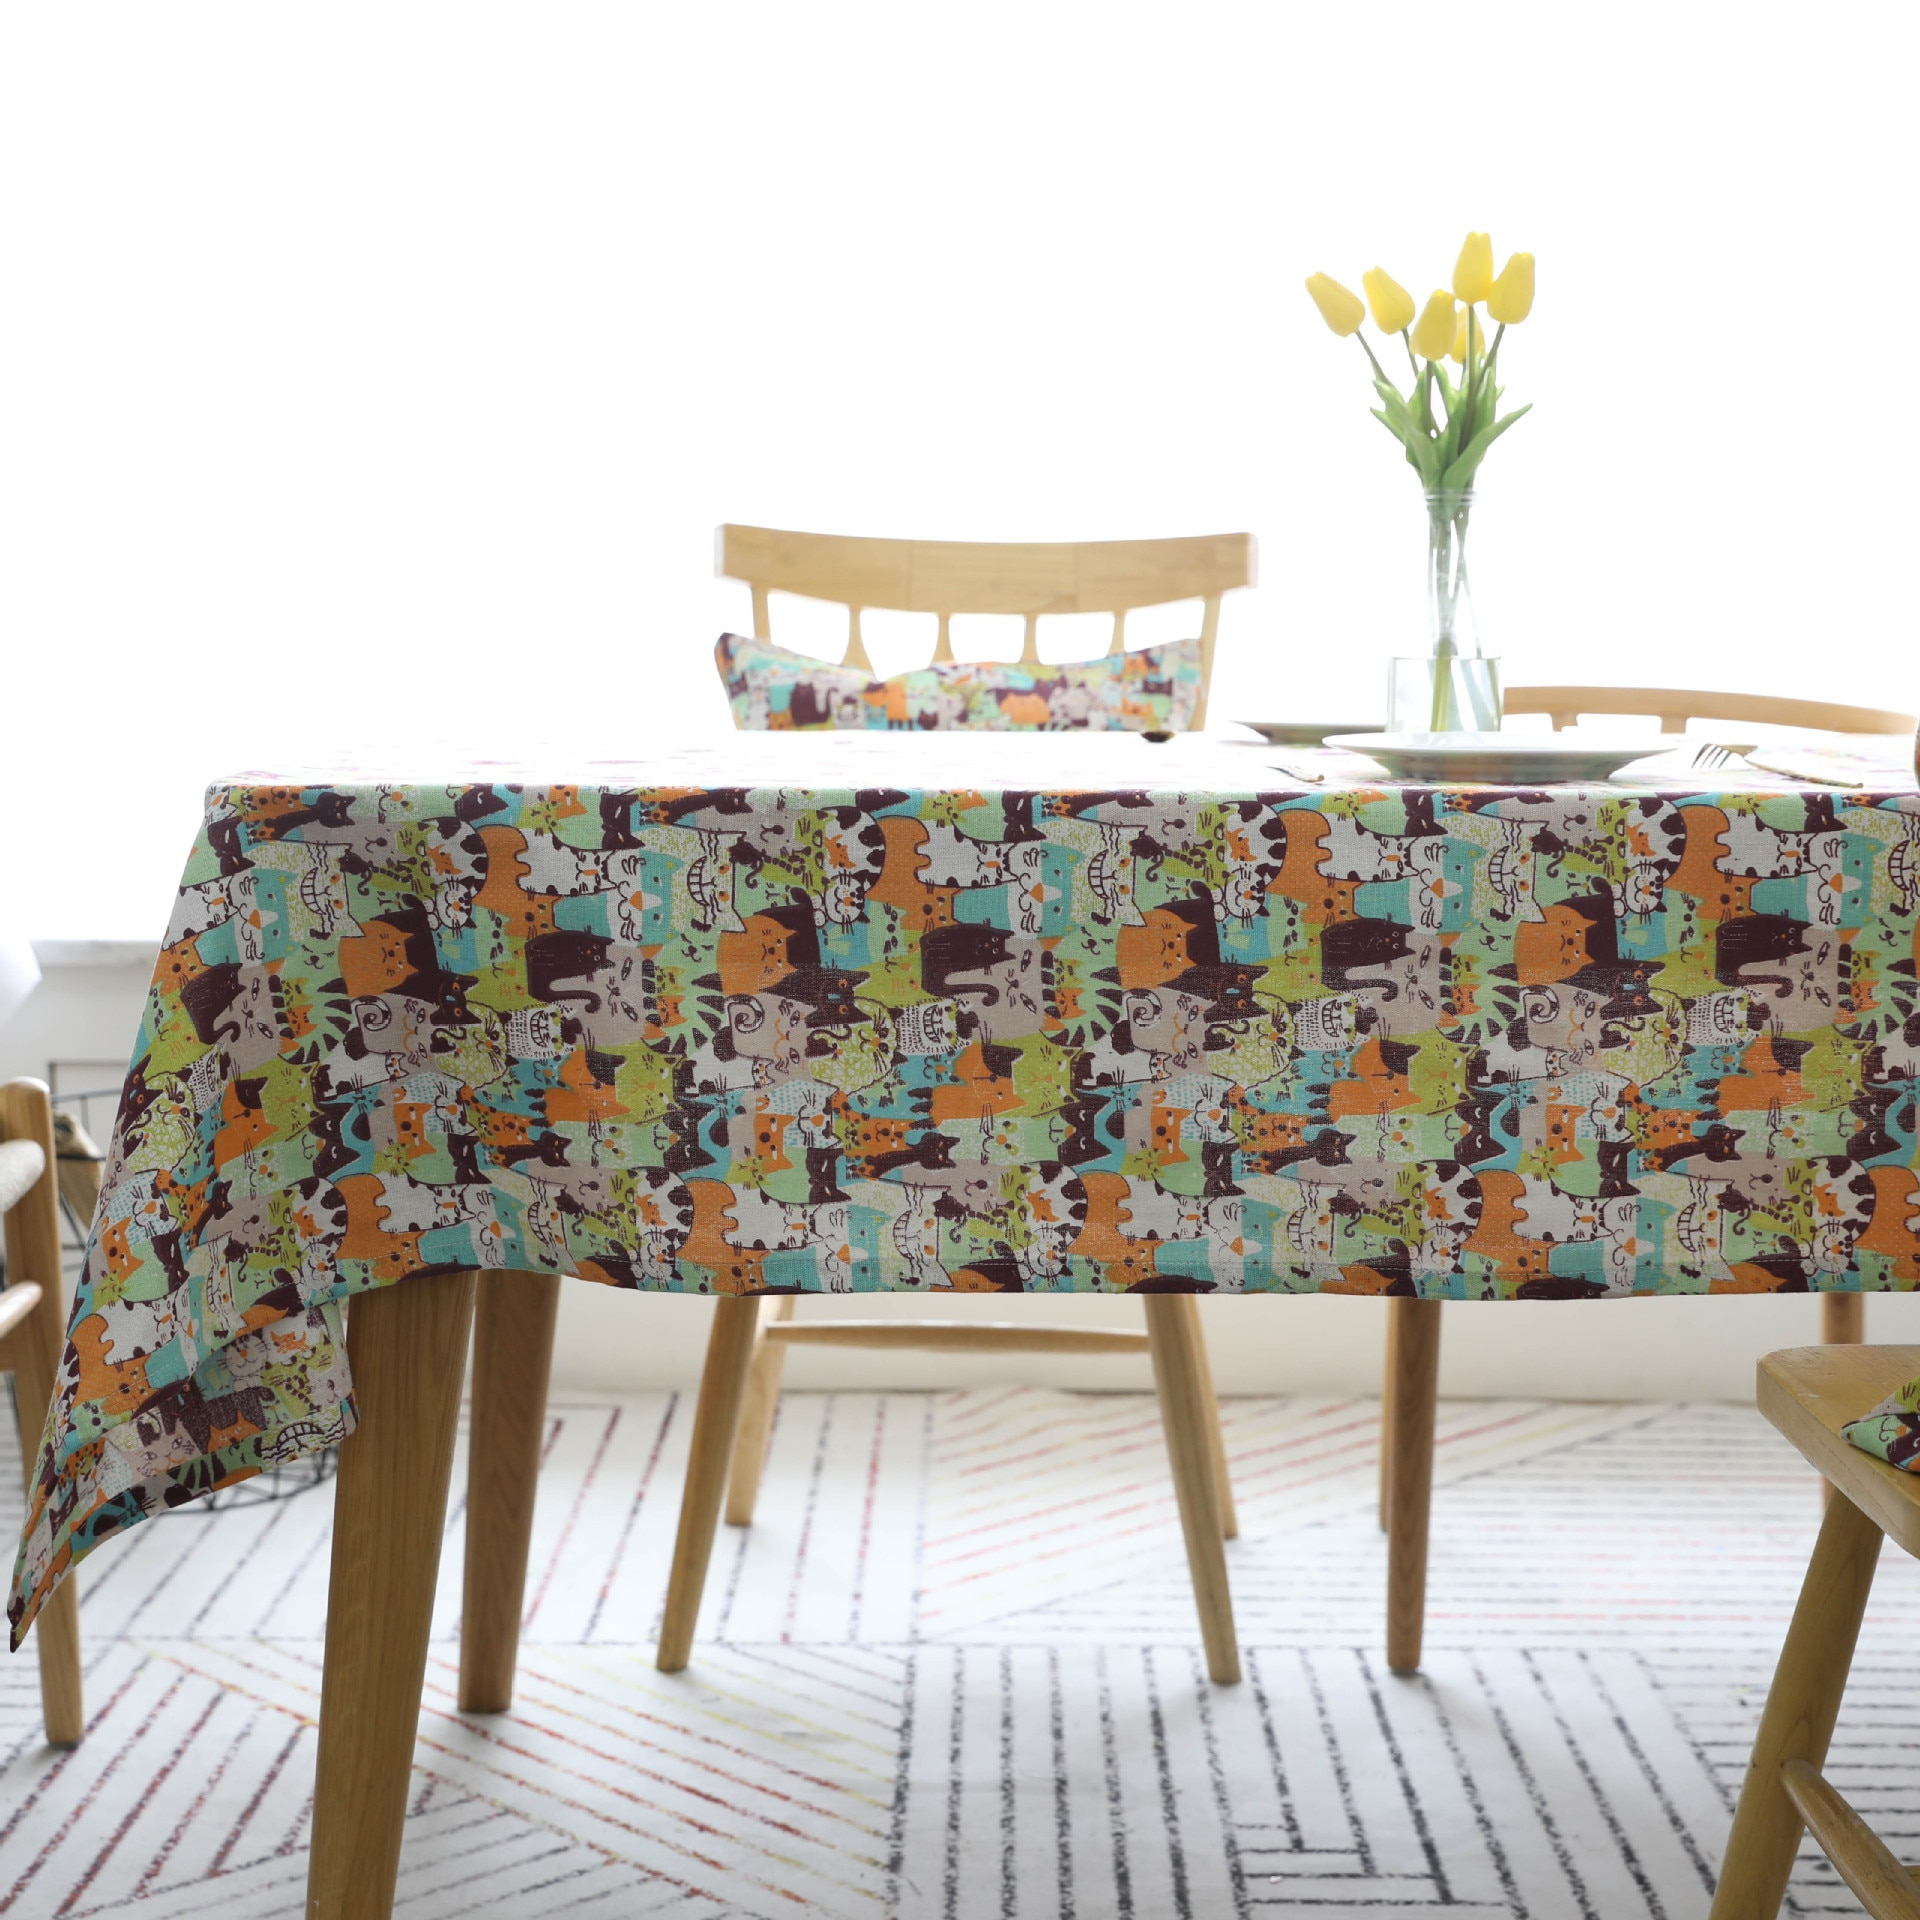 Mantel de caricaturas Sytlish, mantel de lino de algodón, mantel de estilo campestre, multifuncional, rectangular, gatos, patrón, hogar, cocina